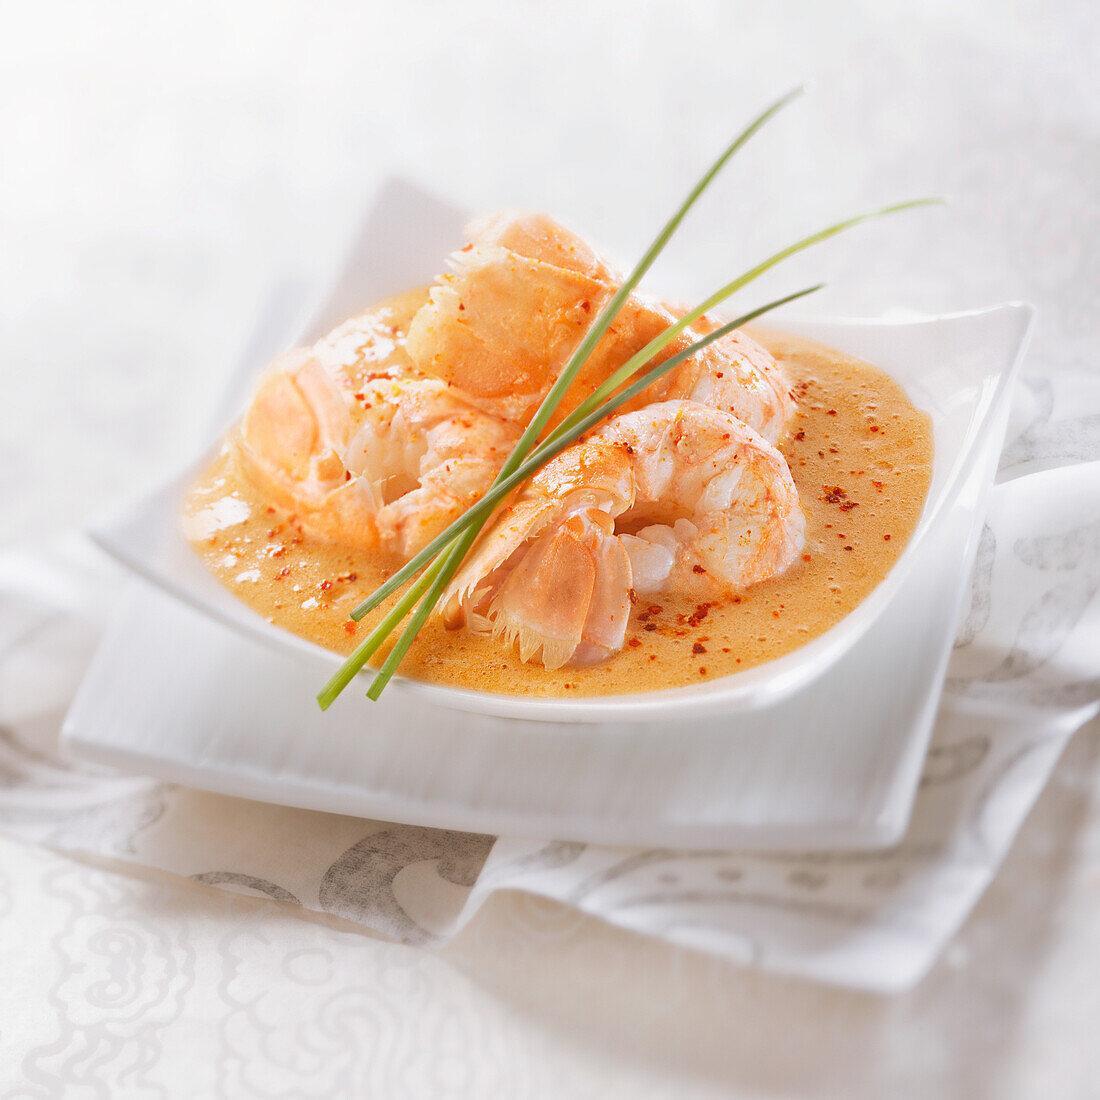 Roasted Dublin Bay prawns with foamy lobster sauce